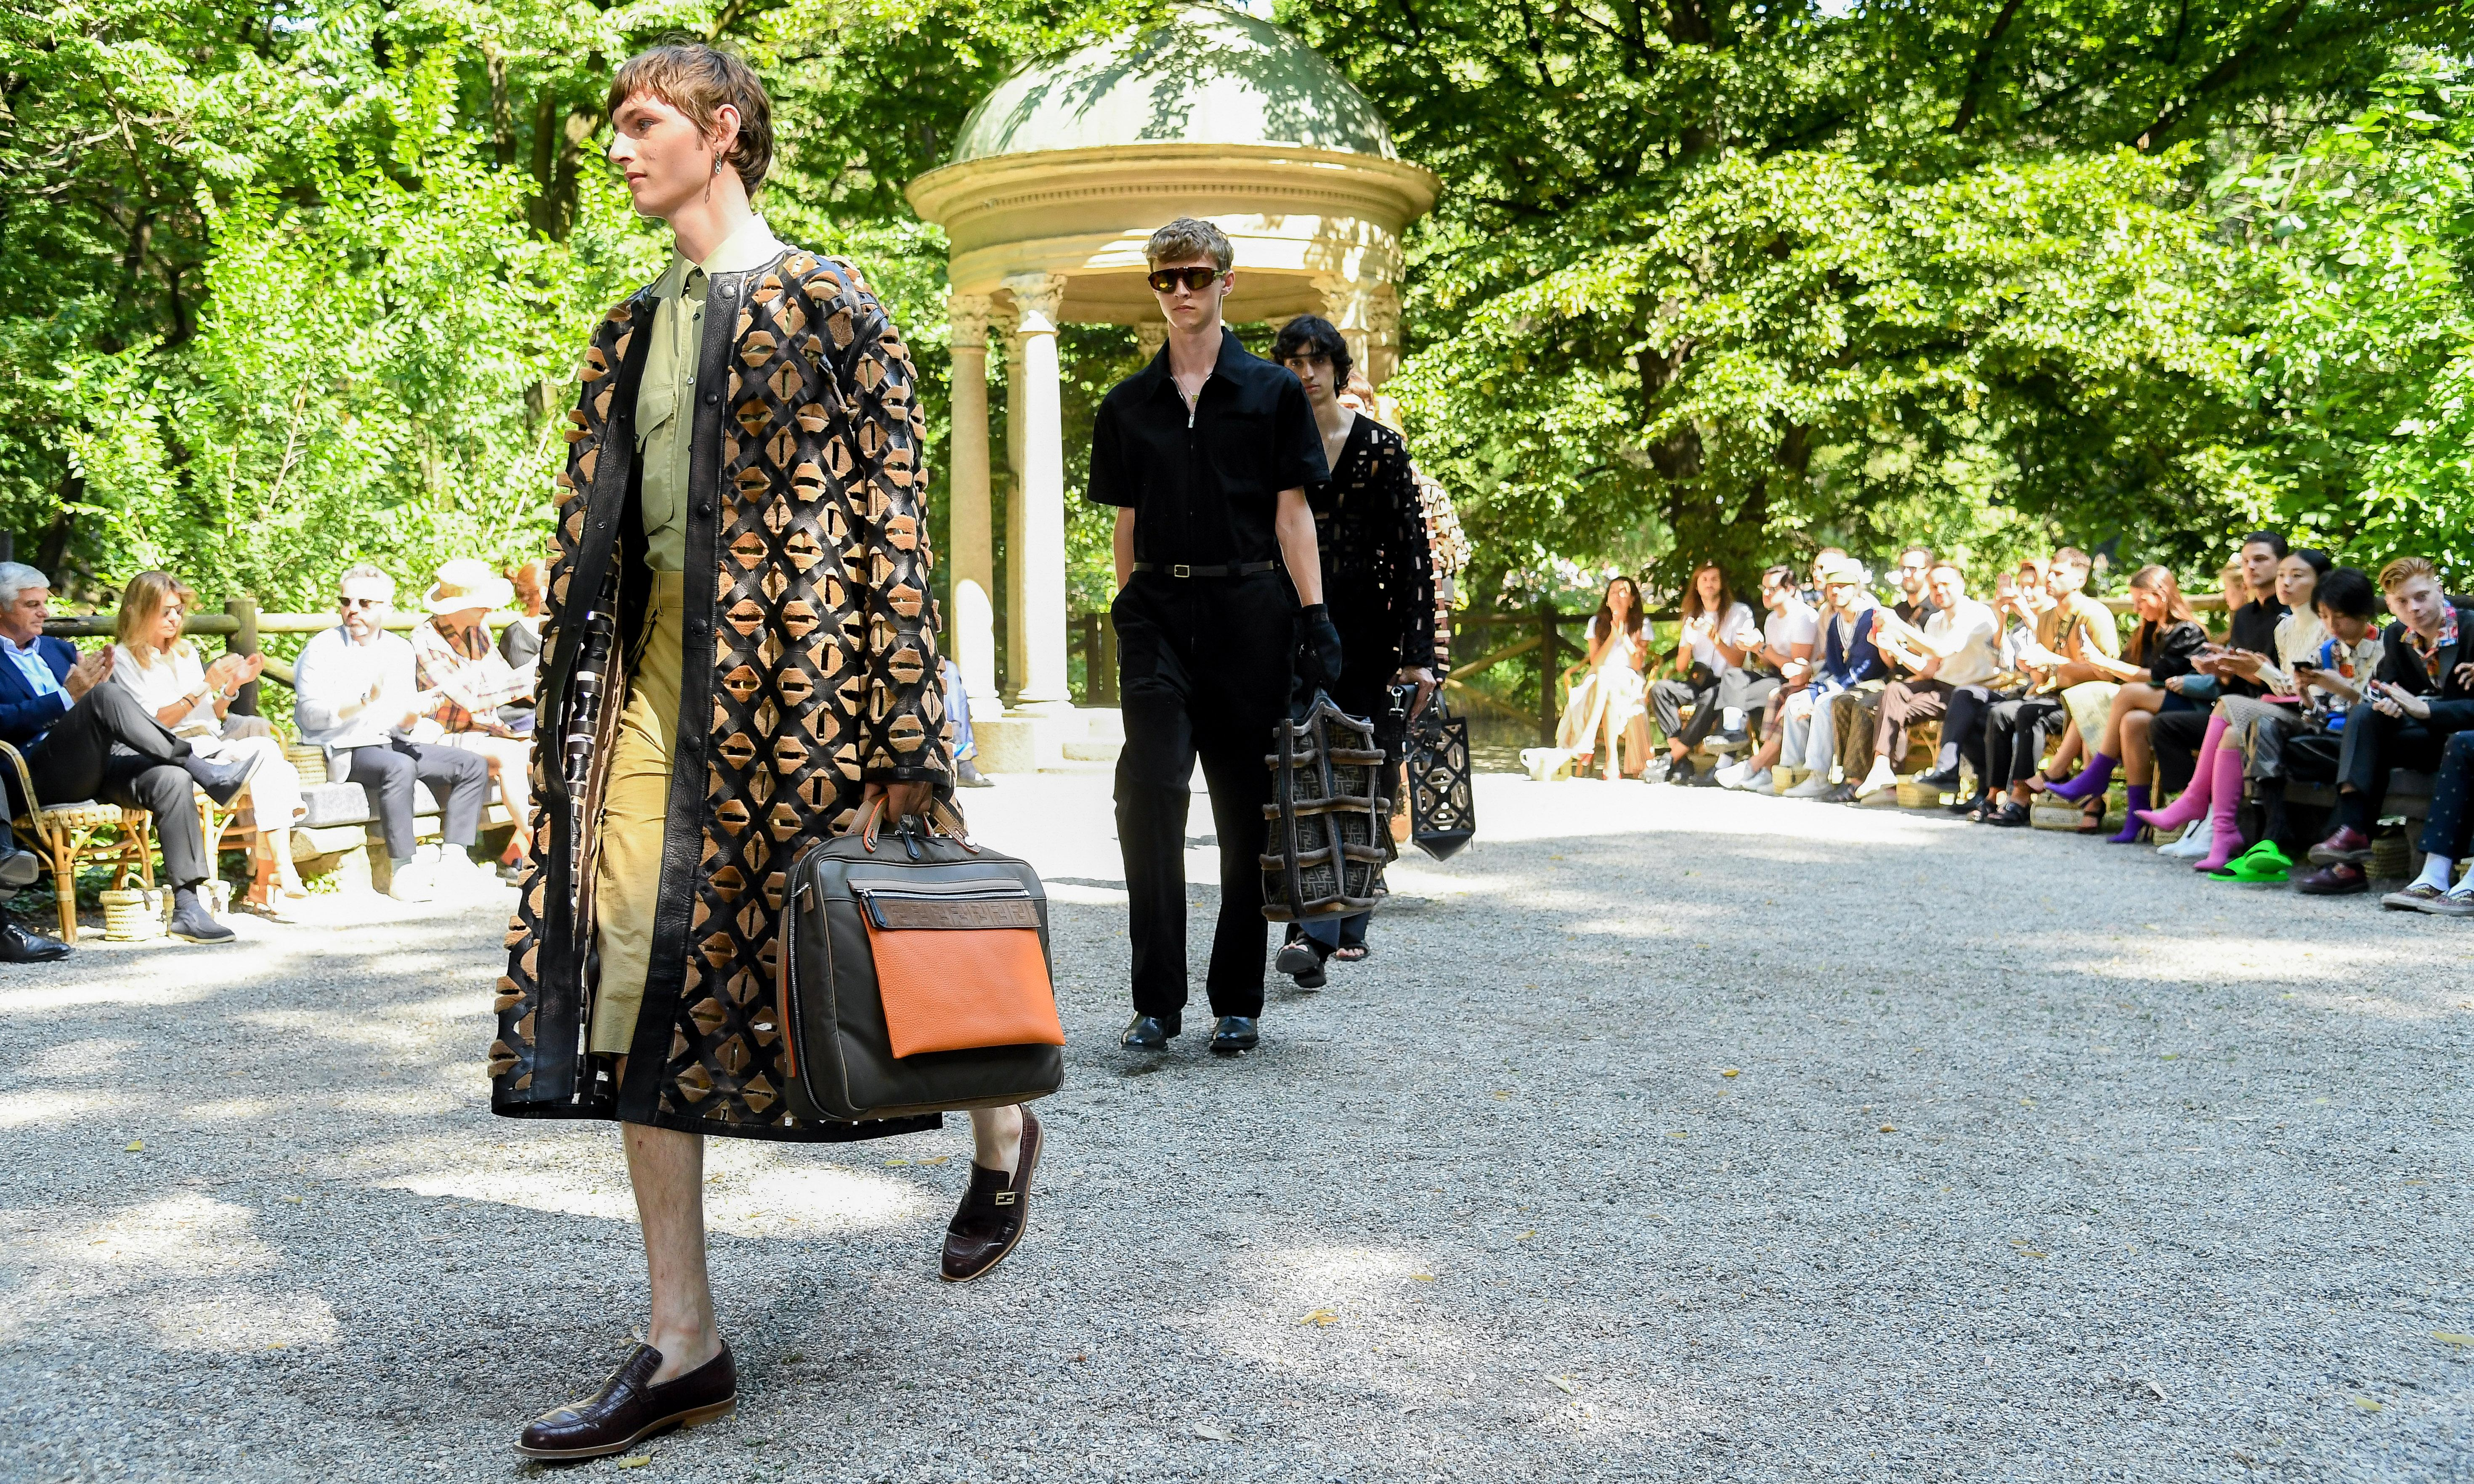 Fendi celebrates Italian summers with help of Luca Guadagnino